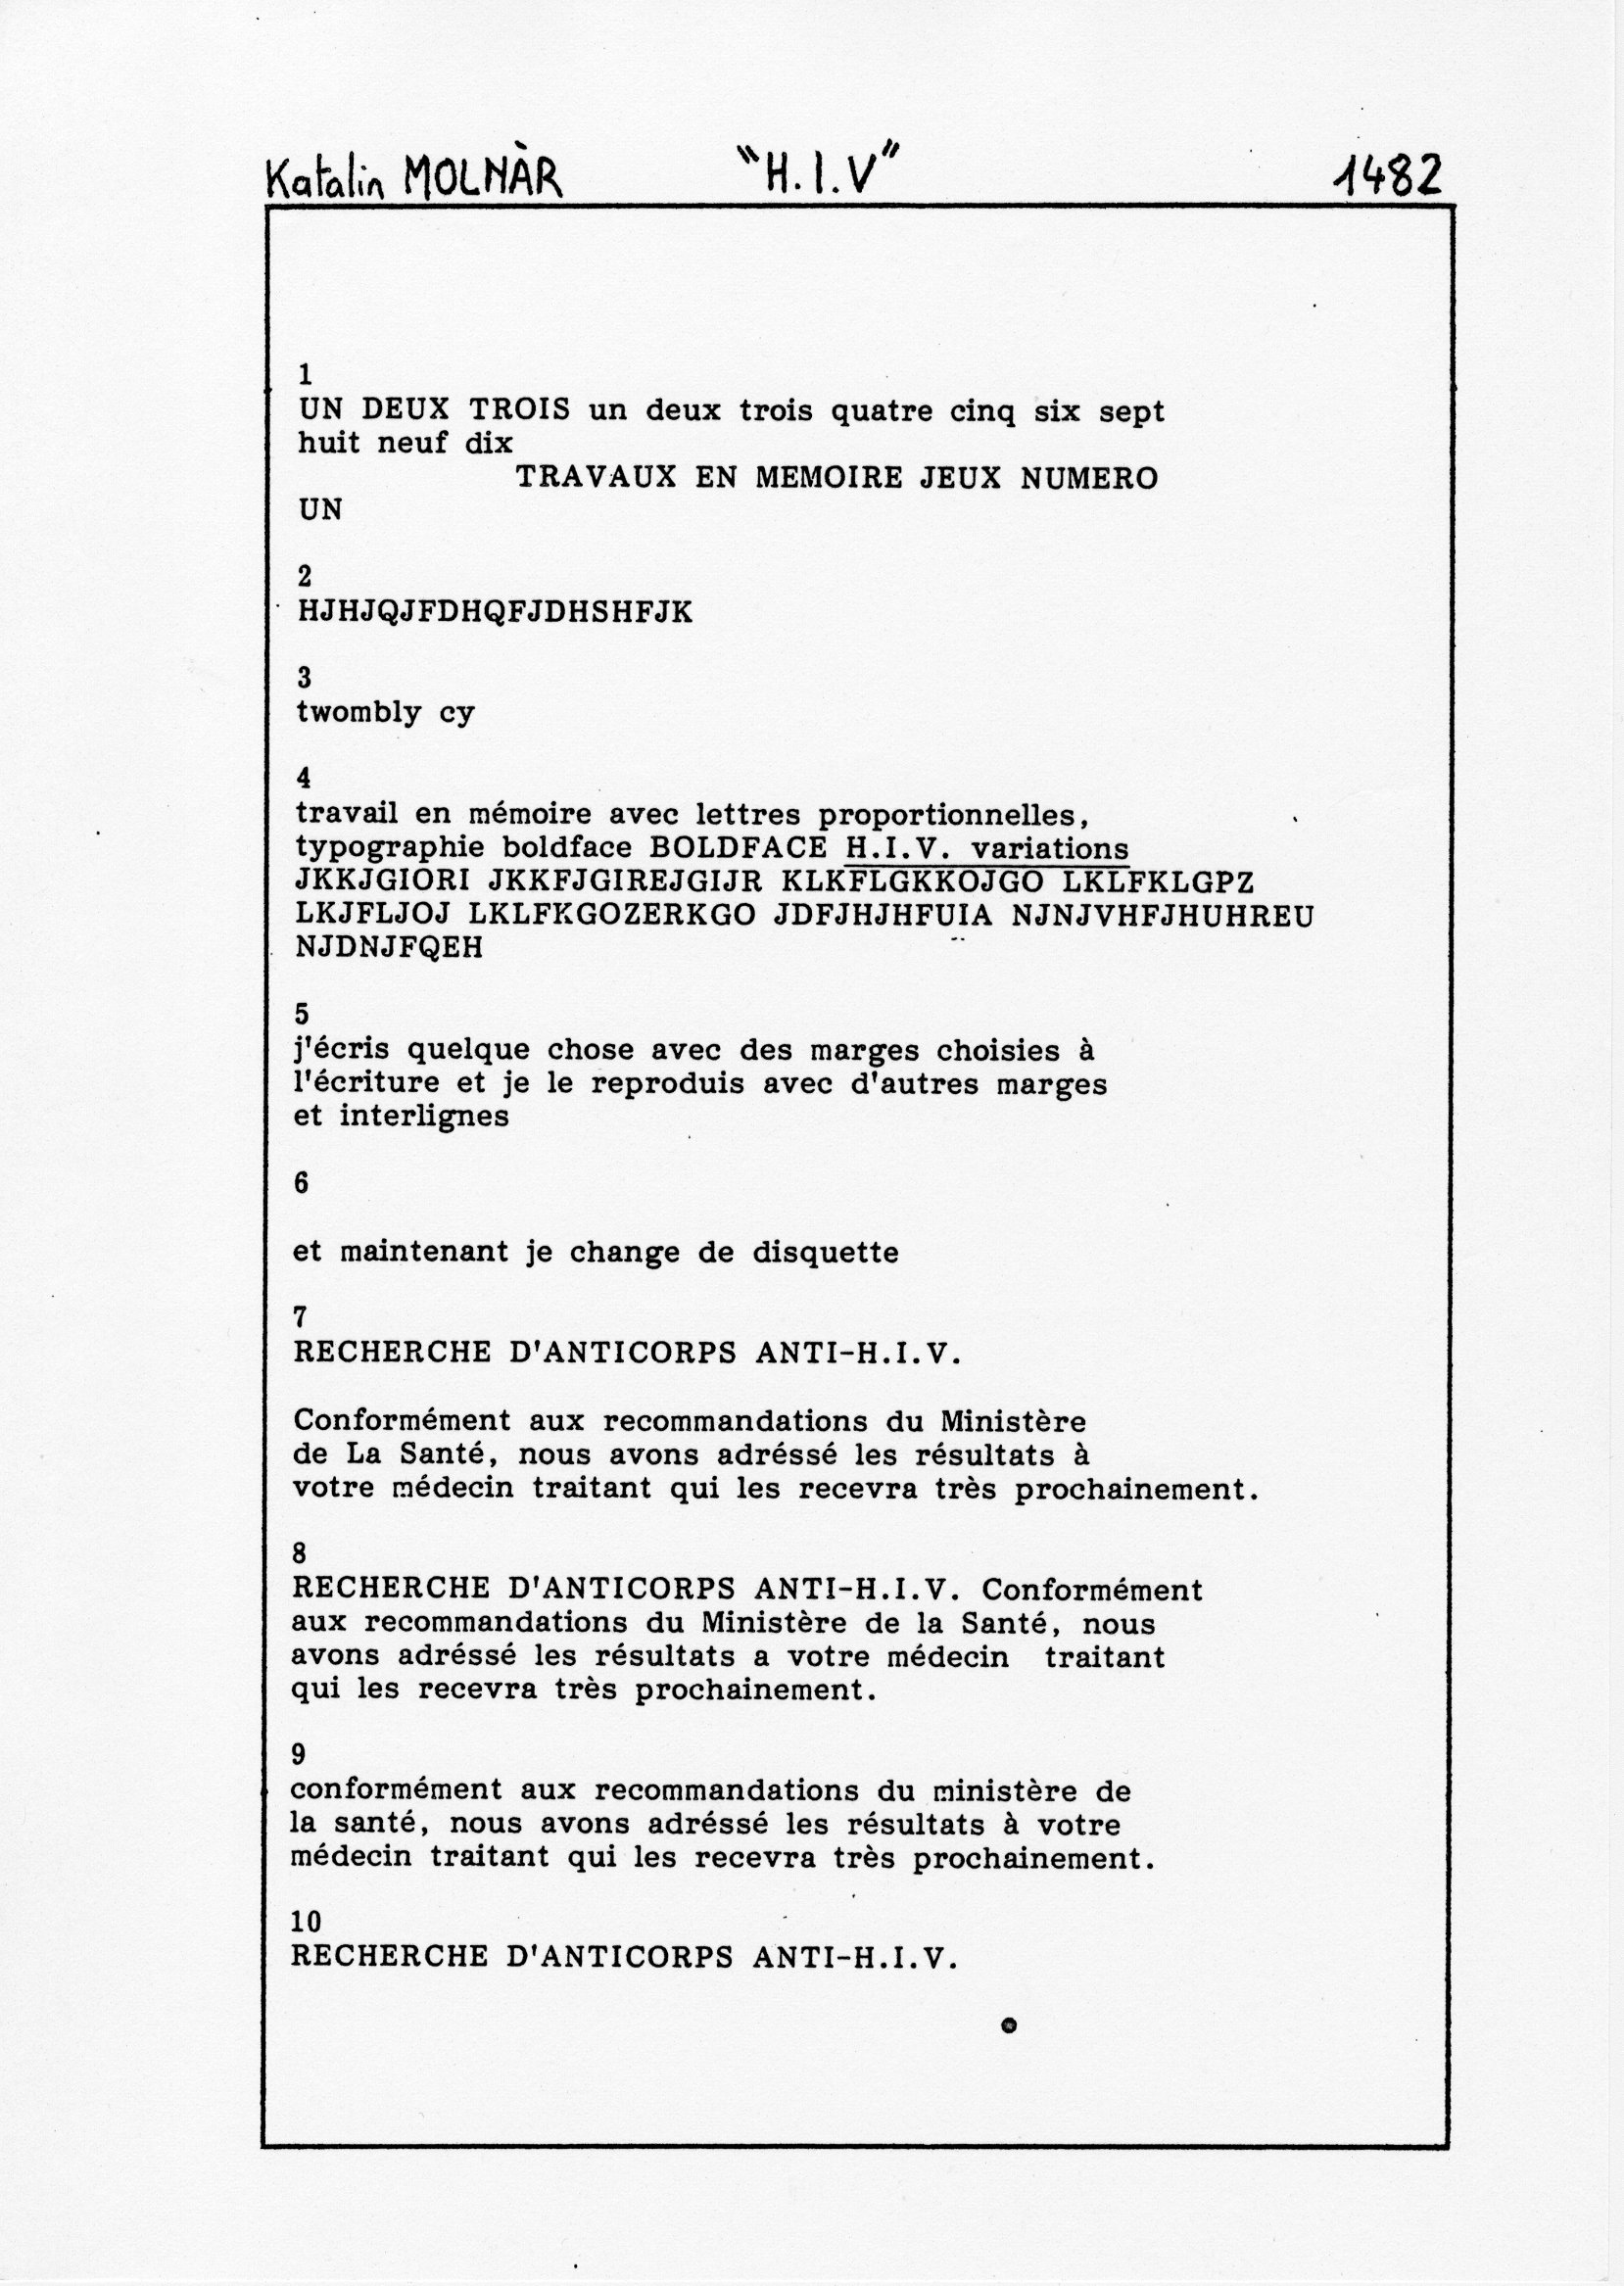 page 1482 K. Molnar H.I.V.